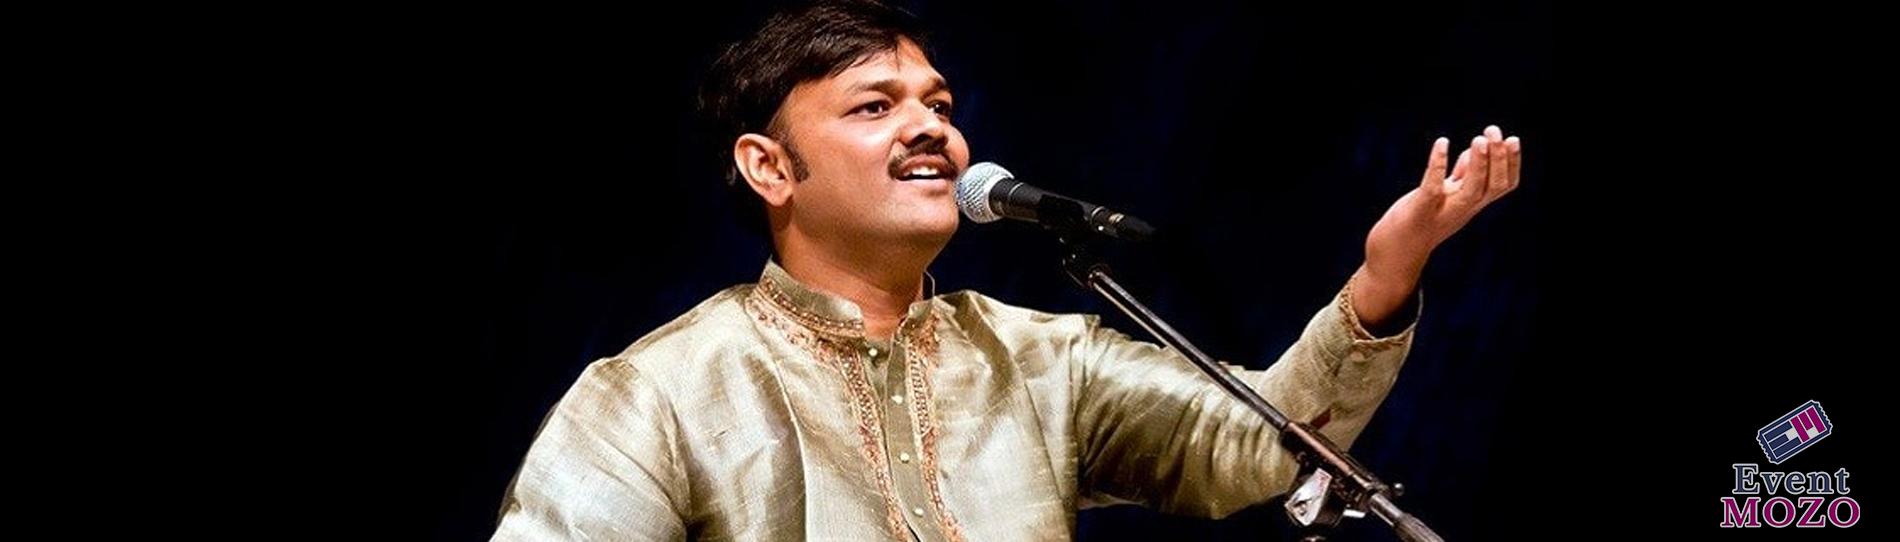 EventMozo Hindustani Classical Vocal Recital By Sanjeev Abhyankar